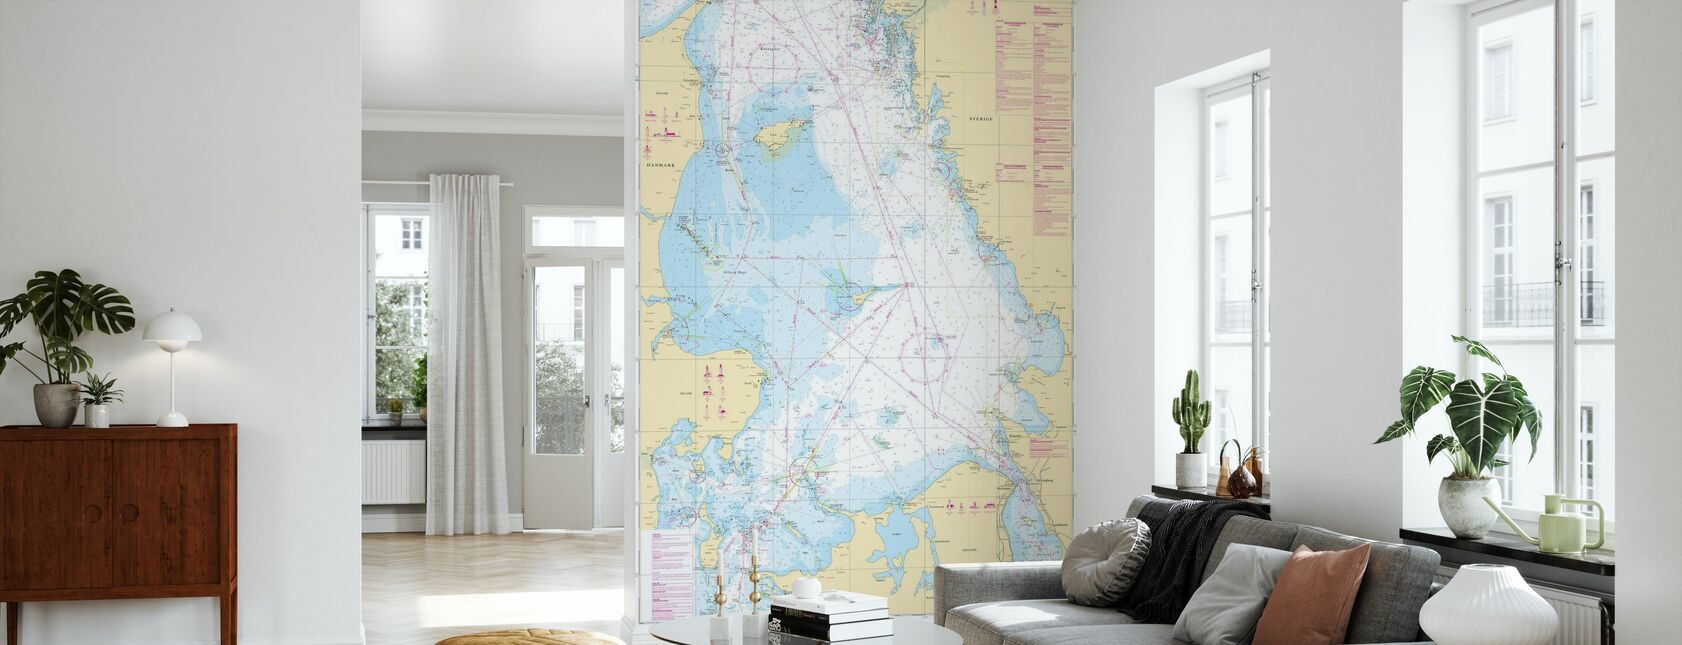 Sea Chart 92 - Kattegatt - Wallpaper - Living Room